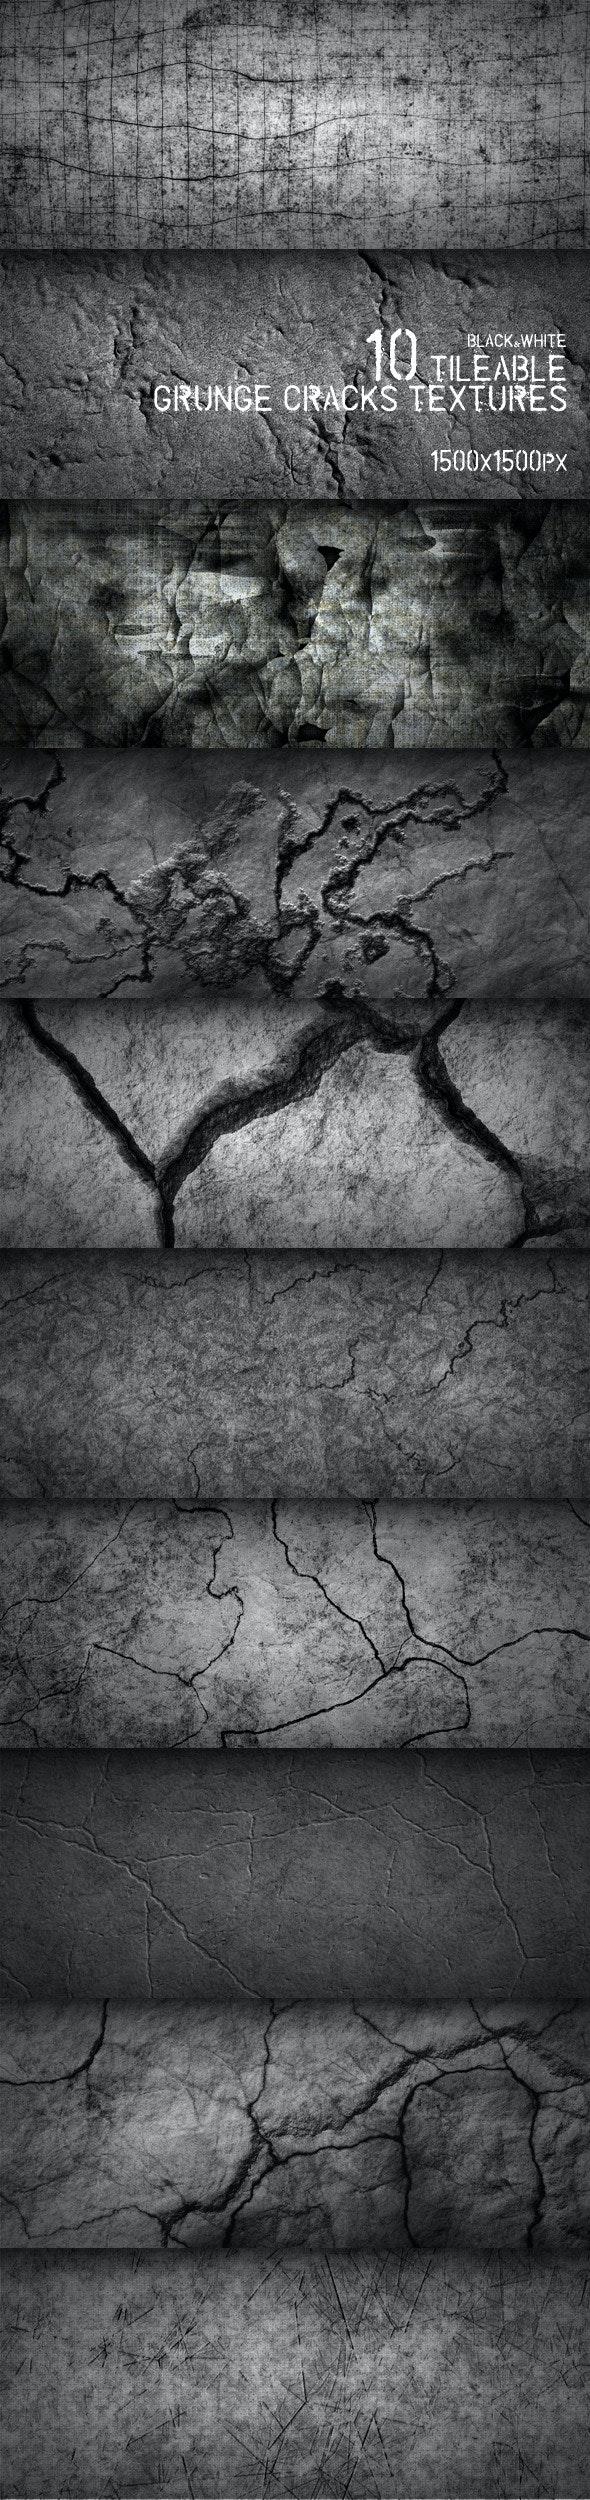 10 Tileable Grunge Cracks Textures - Miscellaneous Textures / Fills / Patterns